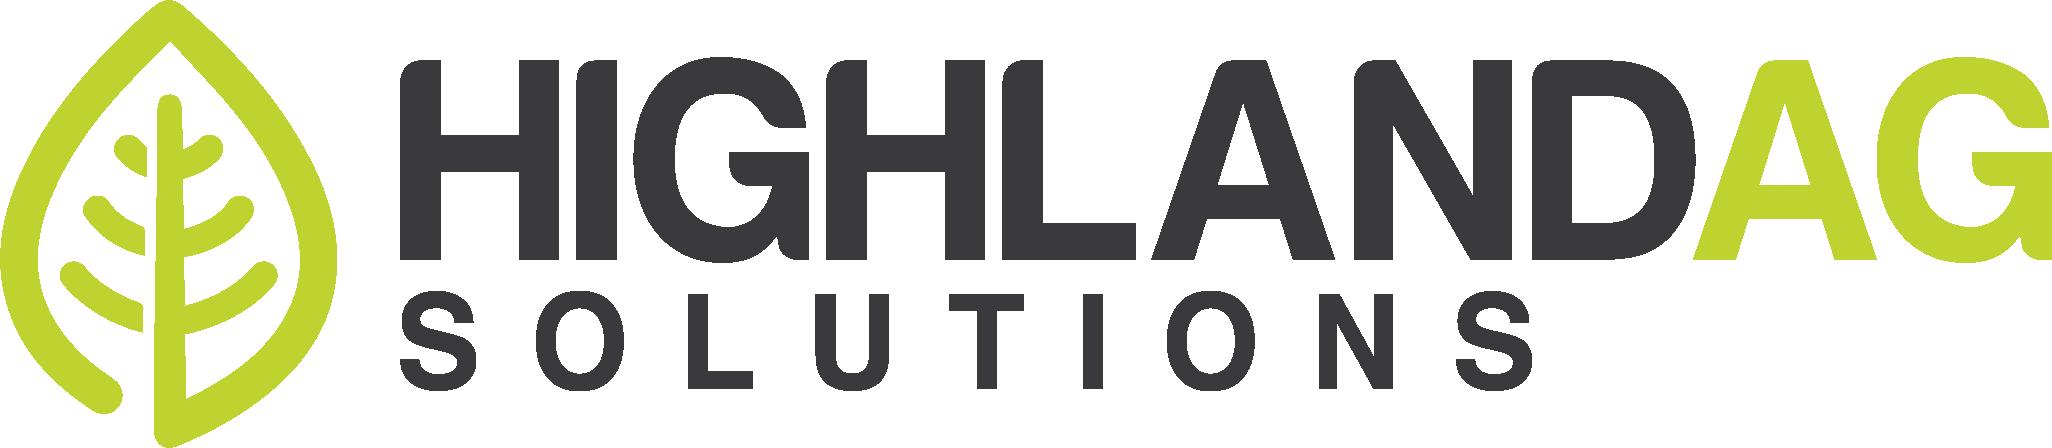 Highland Ag Solutions